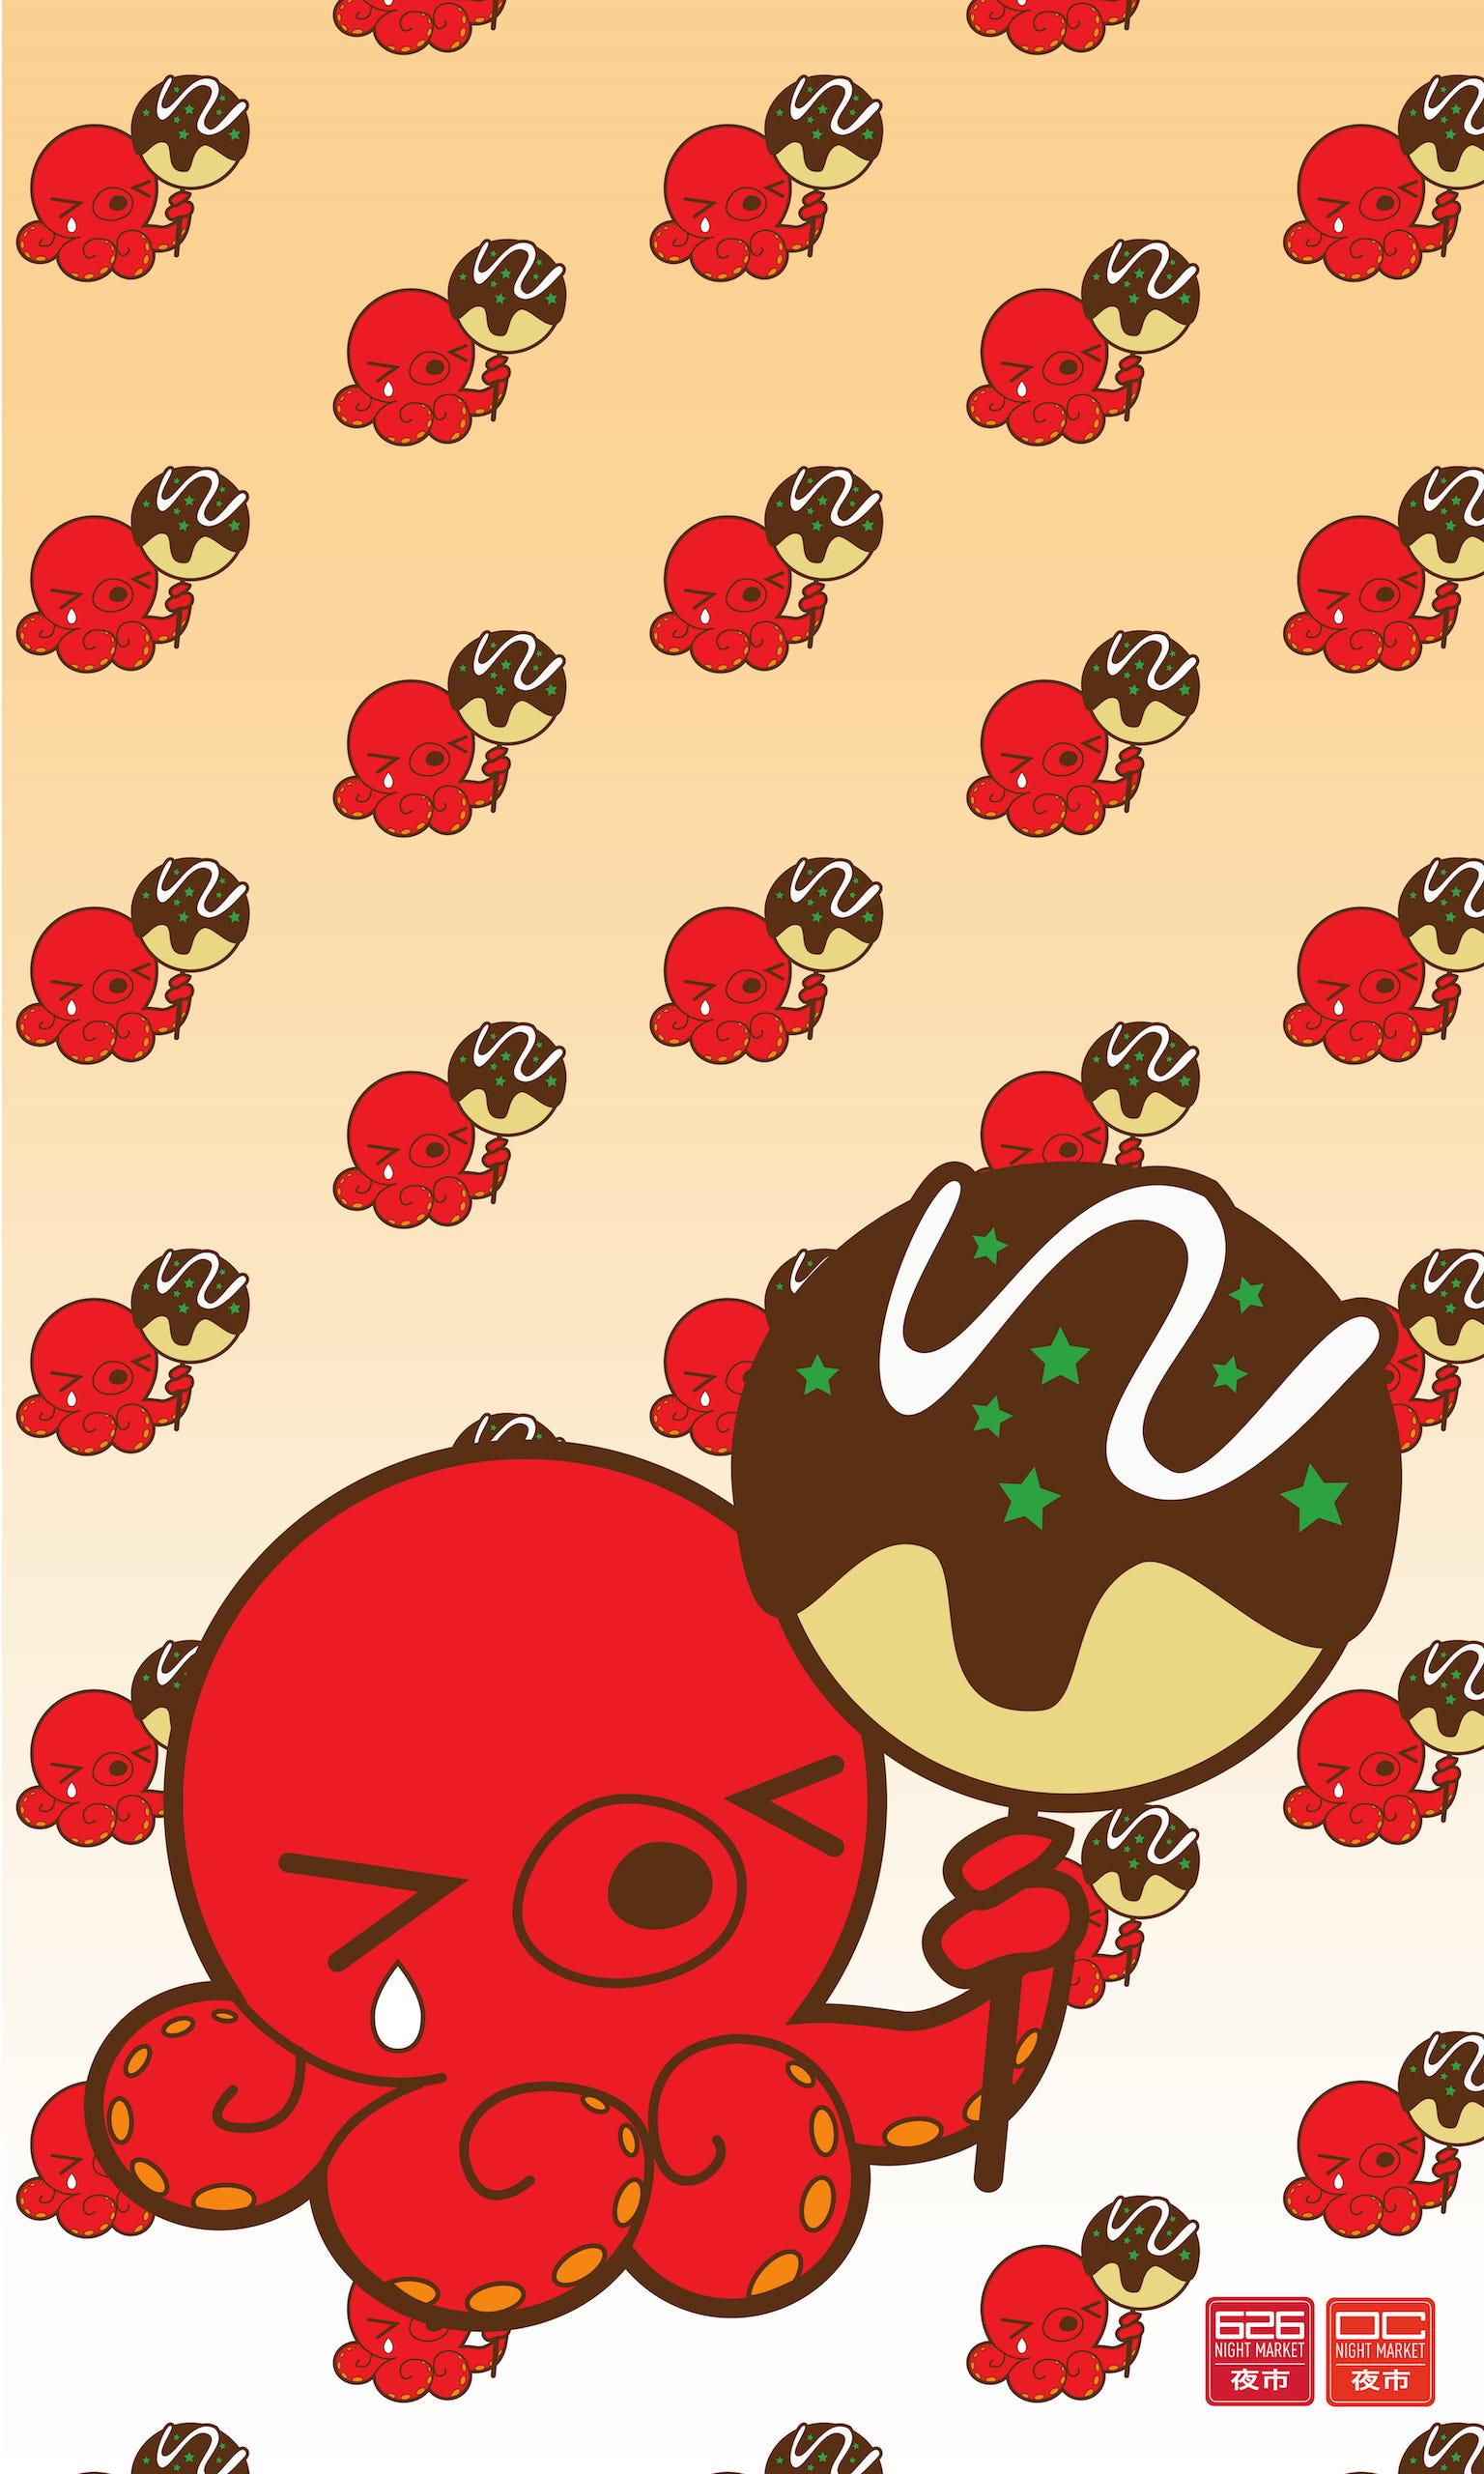 oc-night-market-takoyaki-phone-wallpaper.jpg